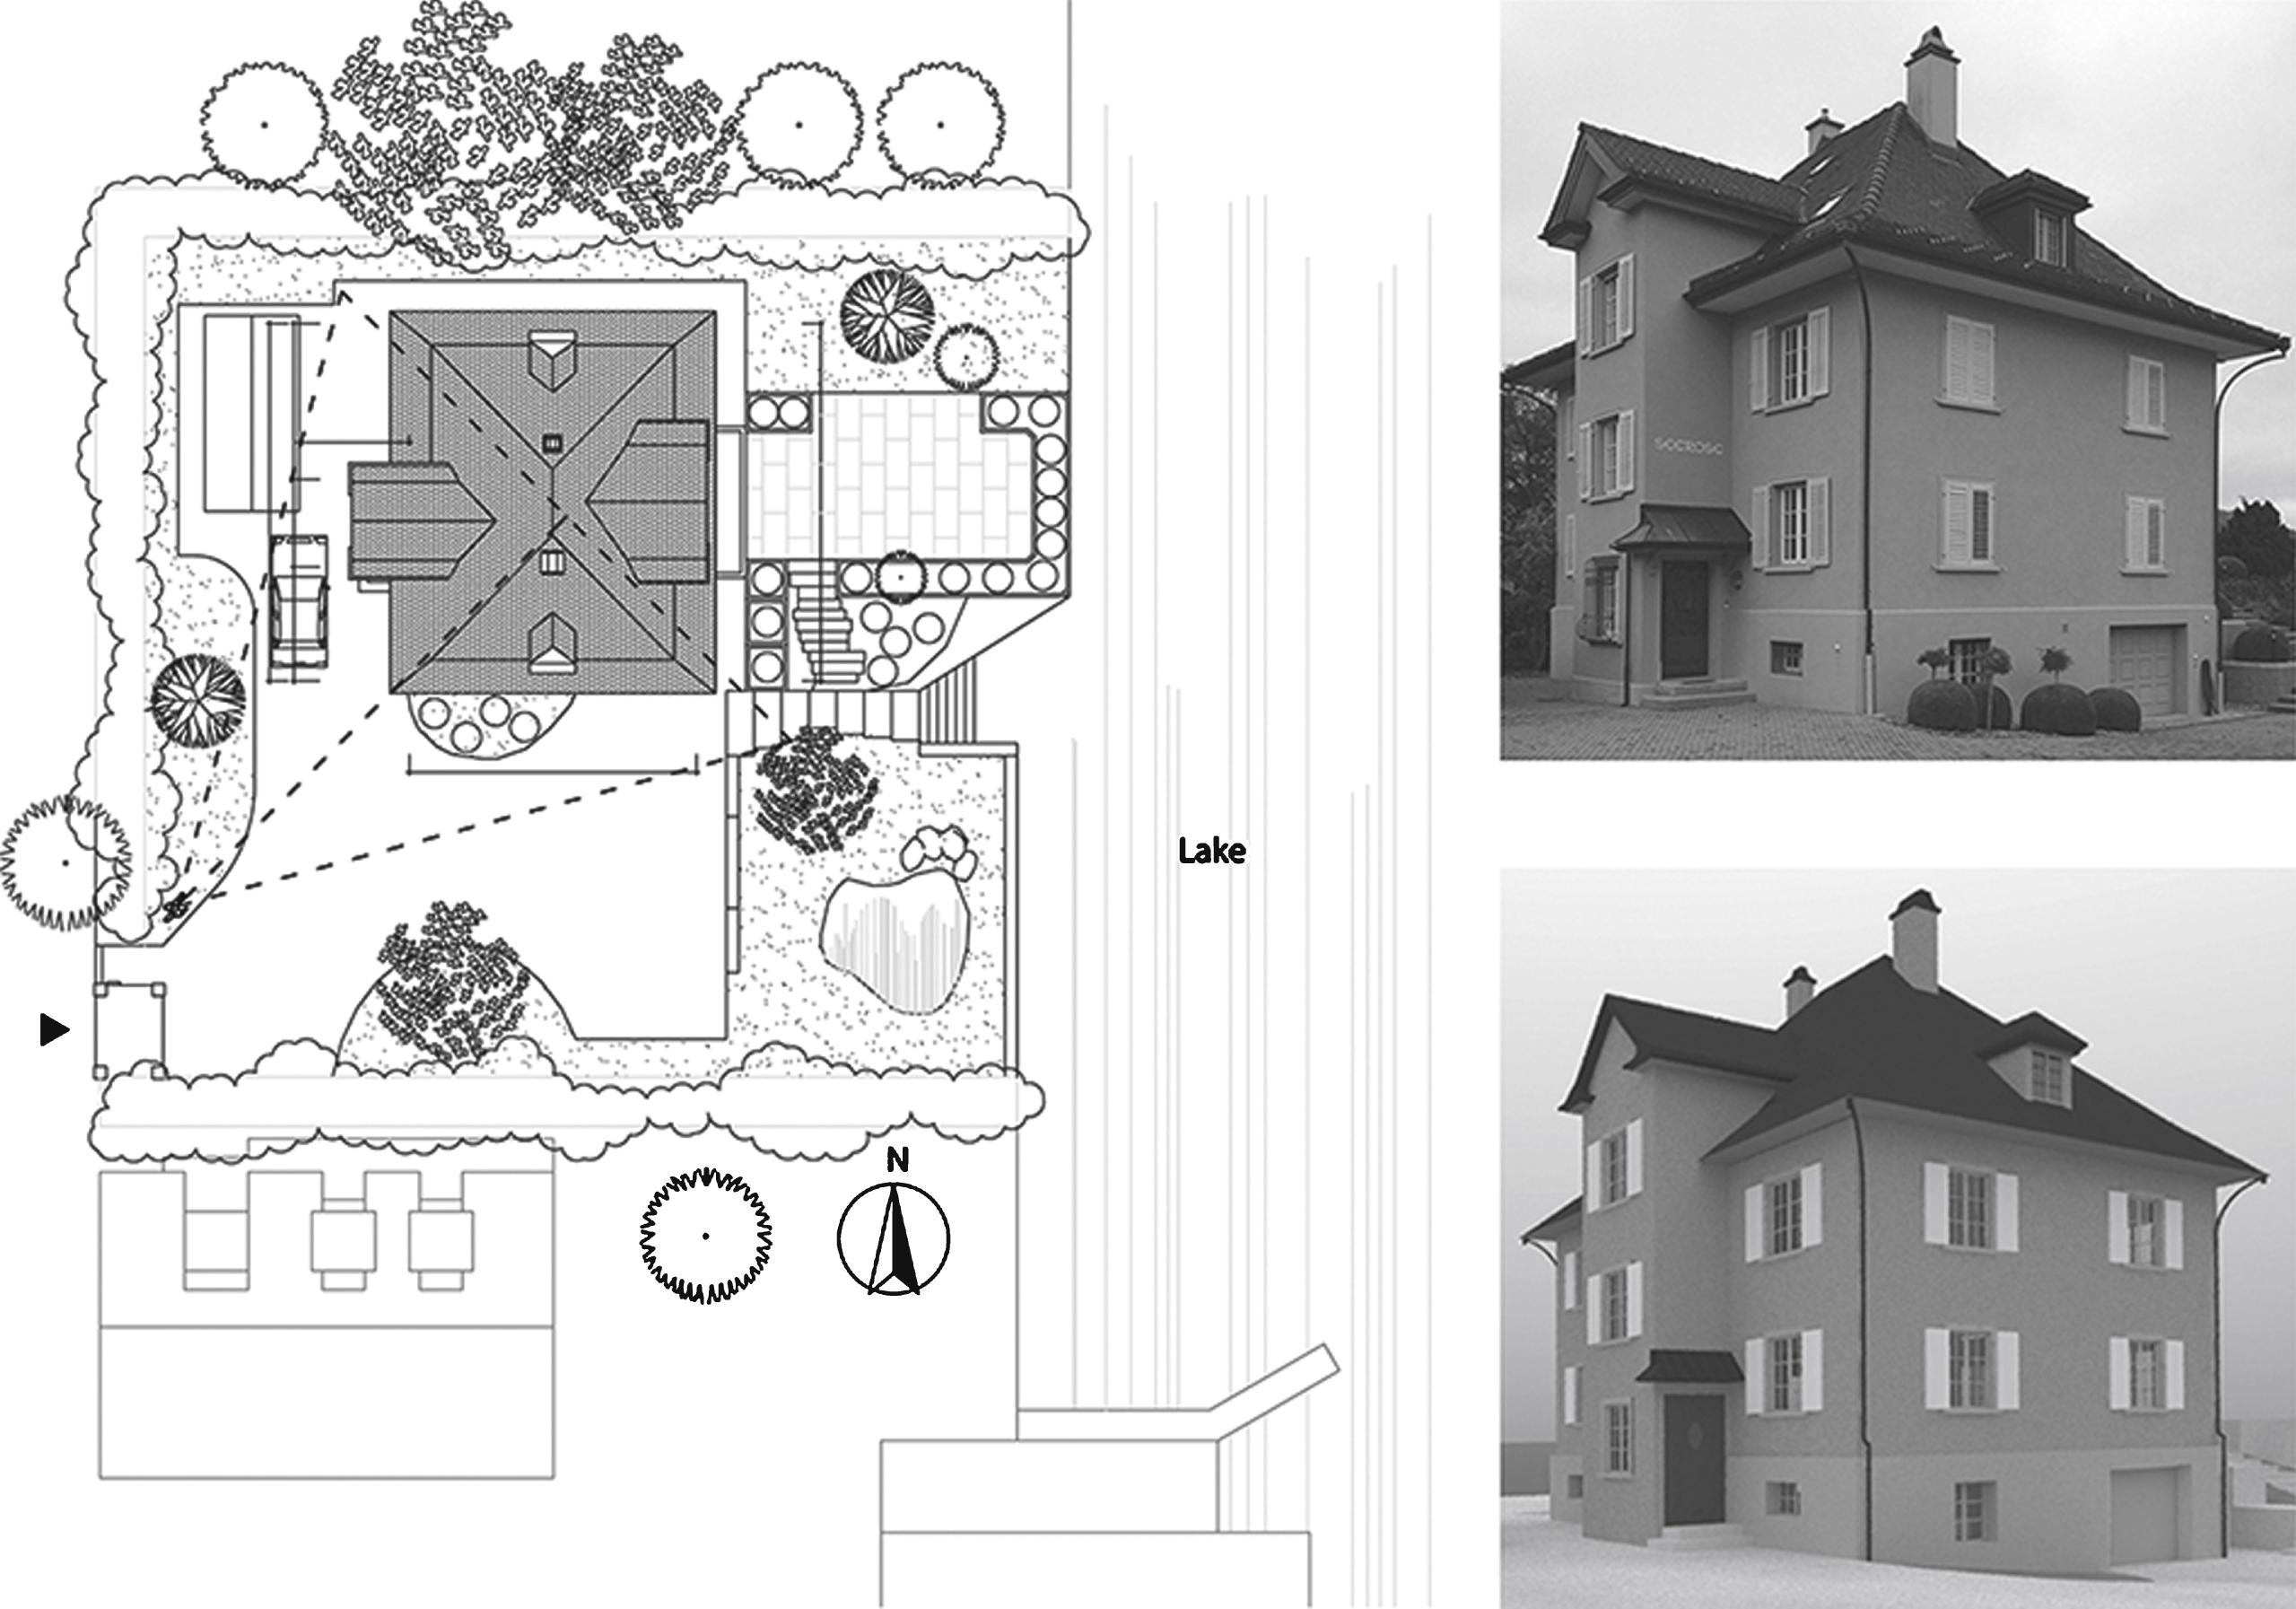 Site Plan Of The Building U0027Seeroseu0027 (left), Photo U0027as Is